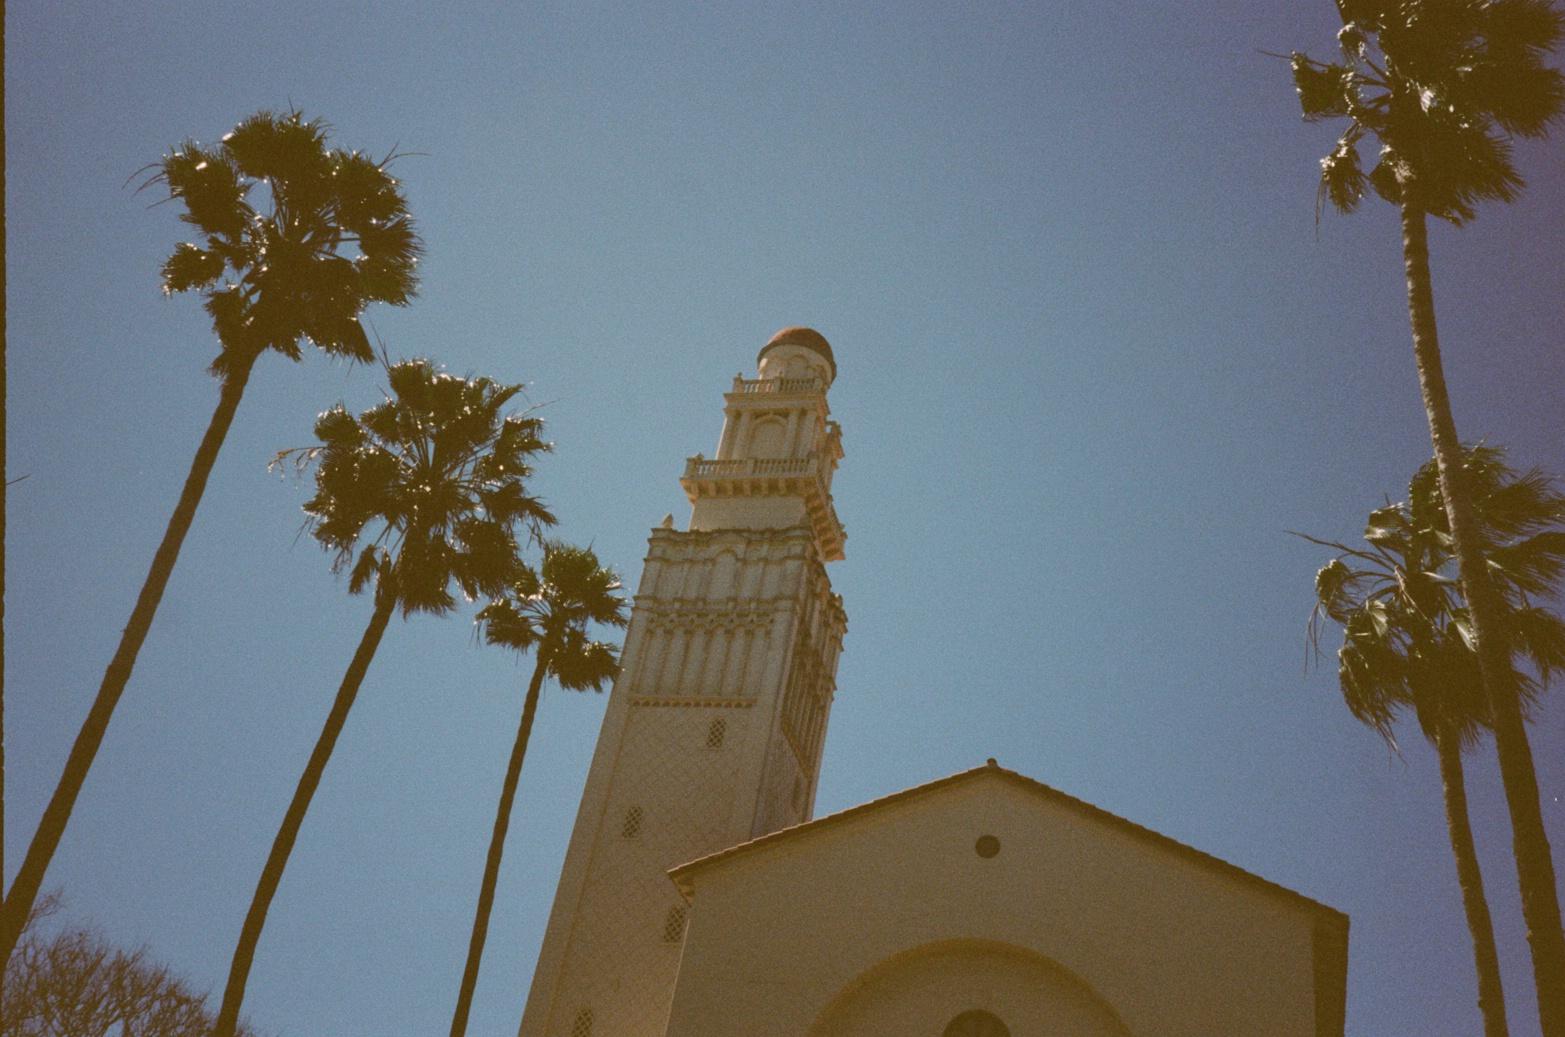 WEST LOS ANGELES, CALIFORNIA | MARCH 2019